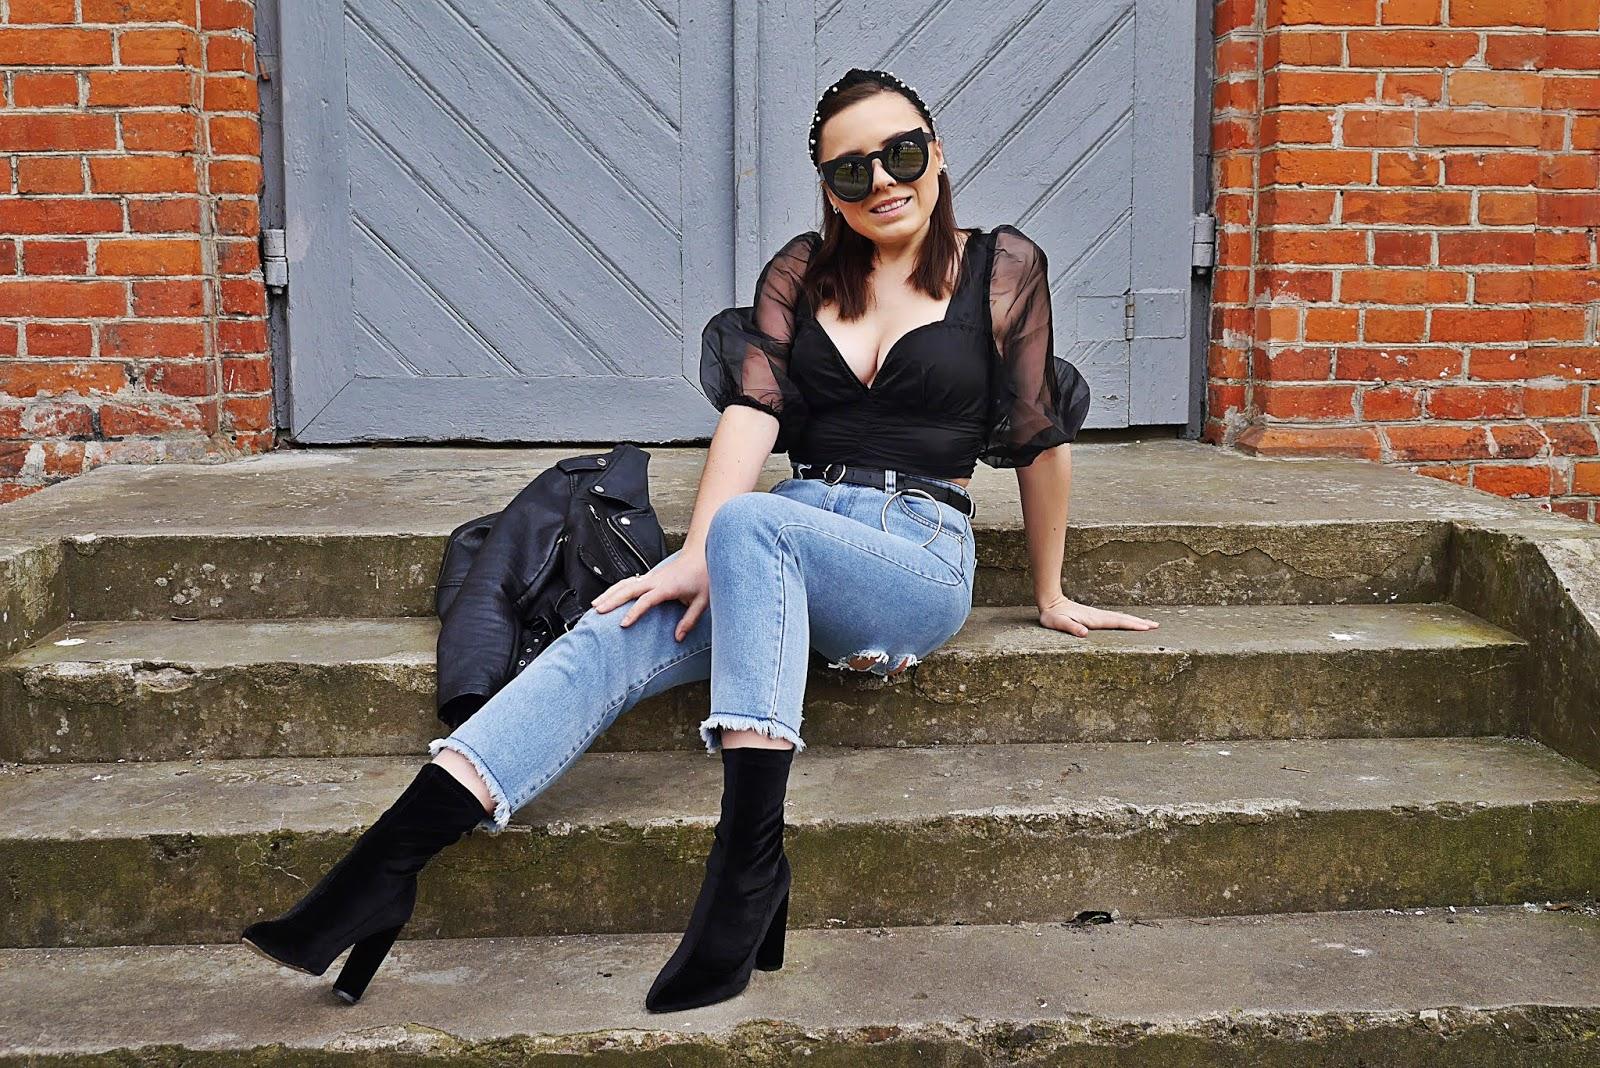 fashion blogger spring outfit look denim pants black top biker jacket aliexpress belt femme luxe